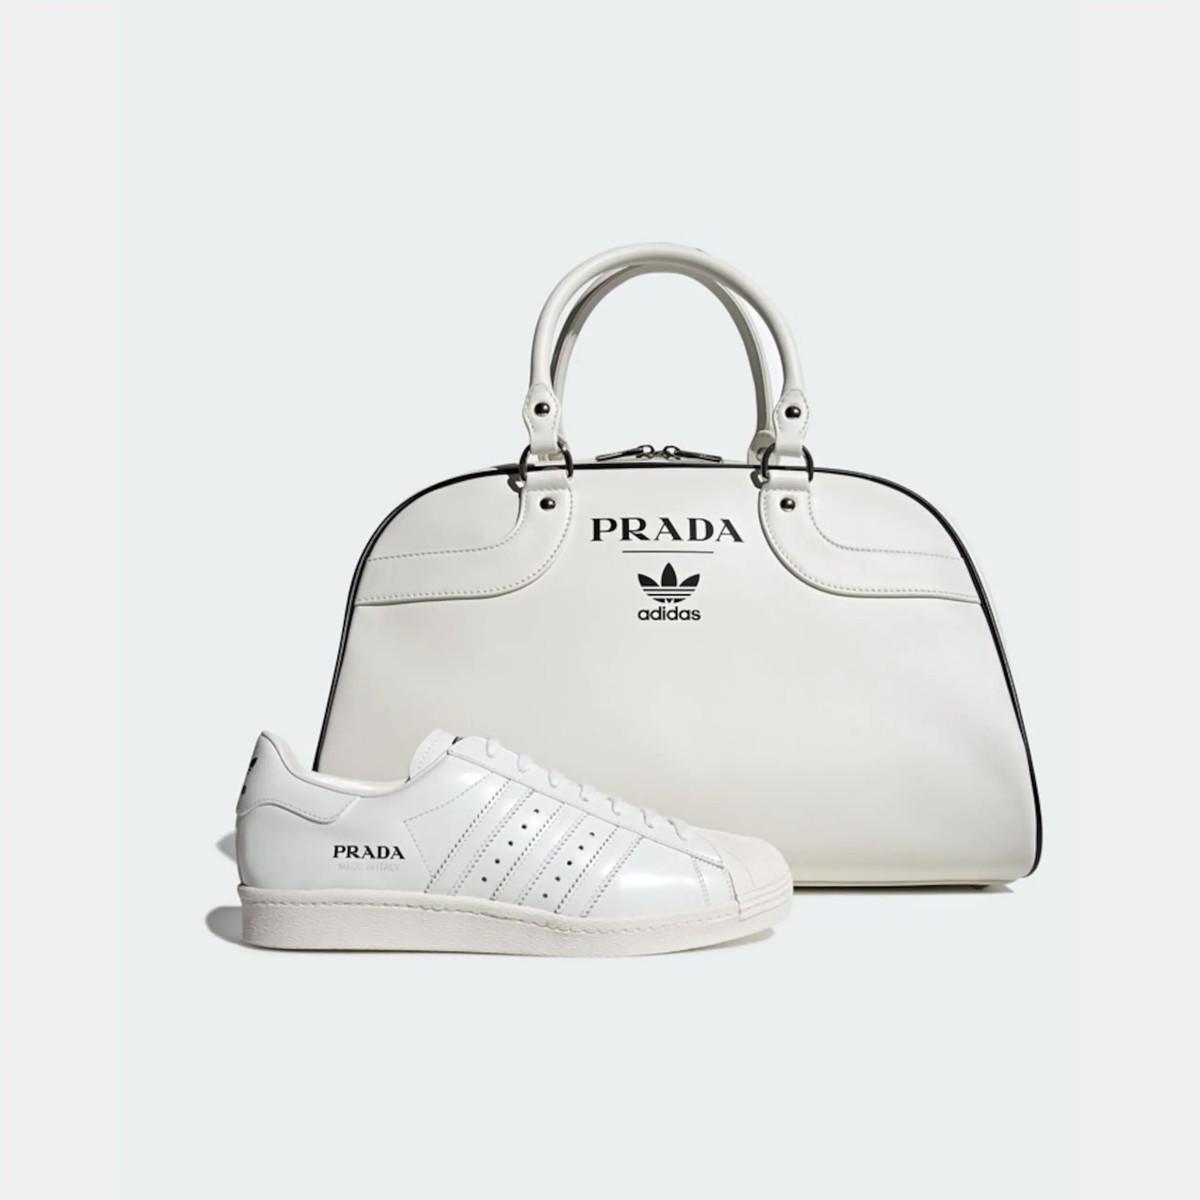 Prada for Adidas: Der ikonischer Superstar Sneaker wird neuinterpretiert 10